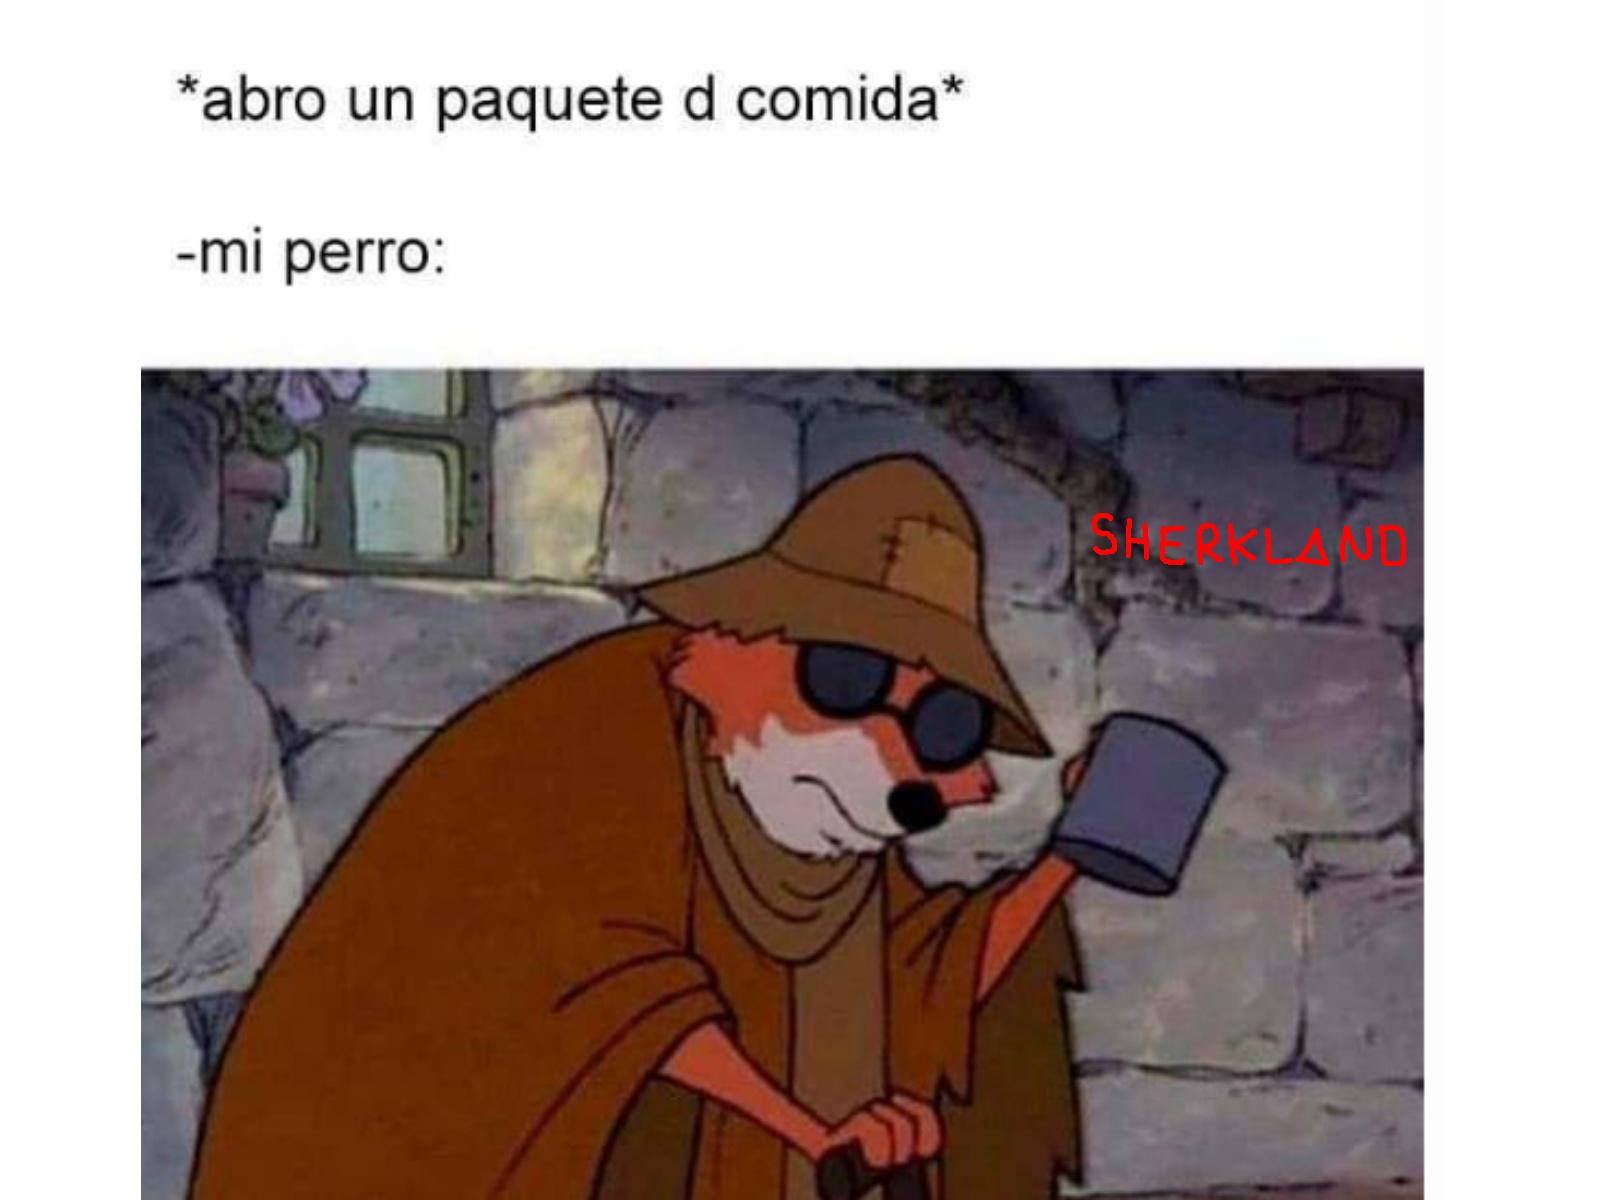 12 - meme